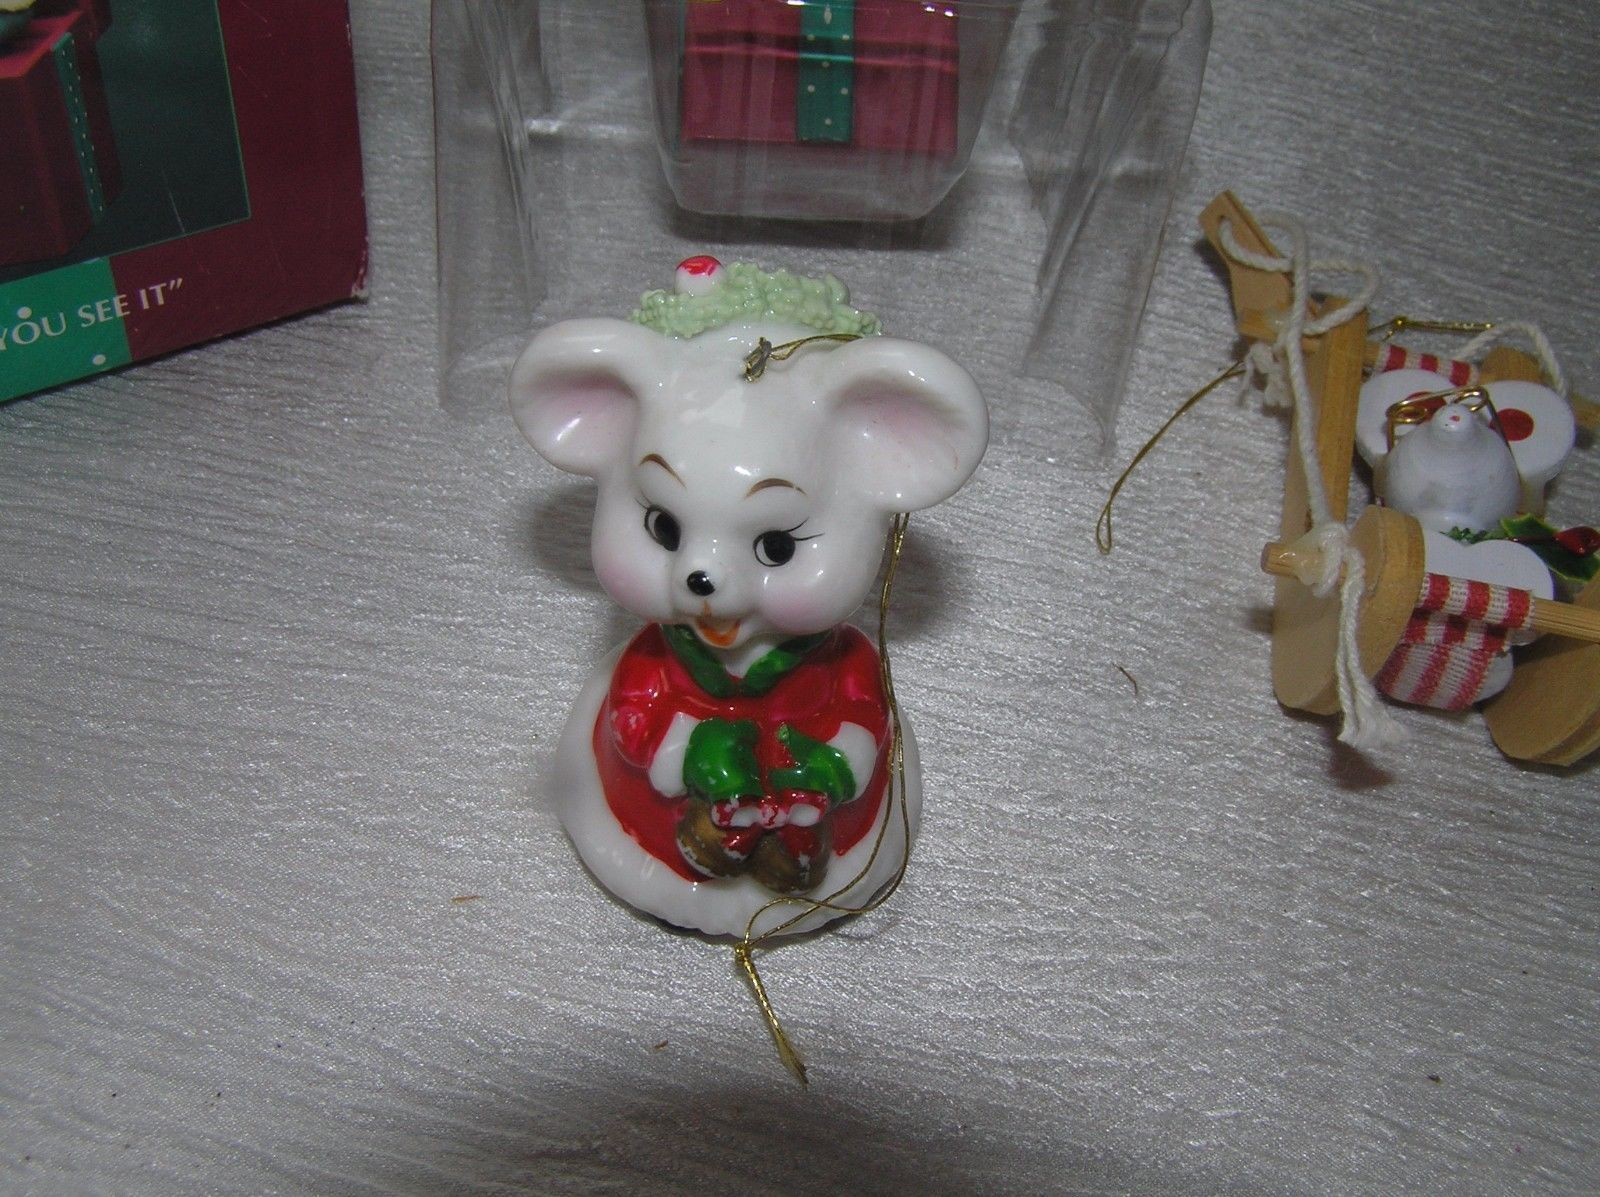 Lot of 3 Painted Wood & Porcelain Enesco Plastic Merry Miss Merry Pop-Up Christ